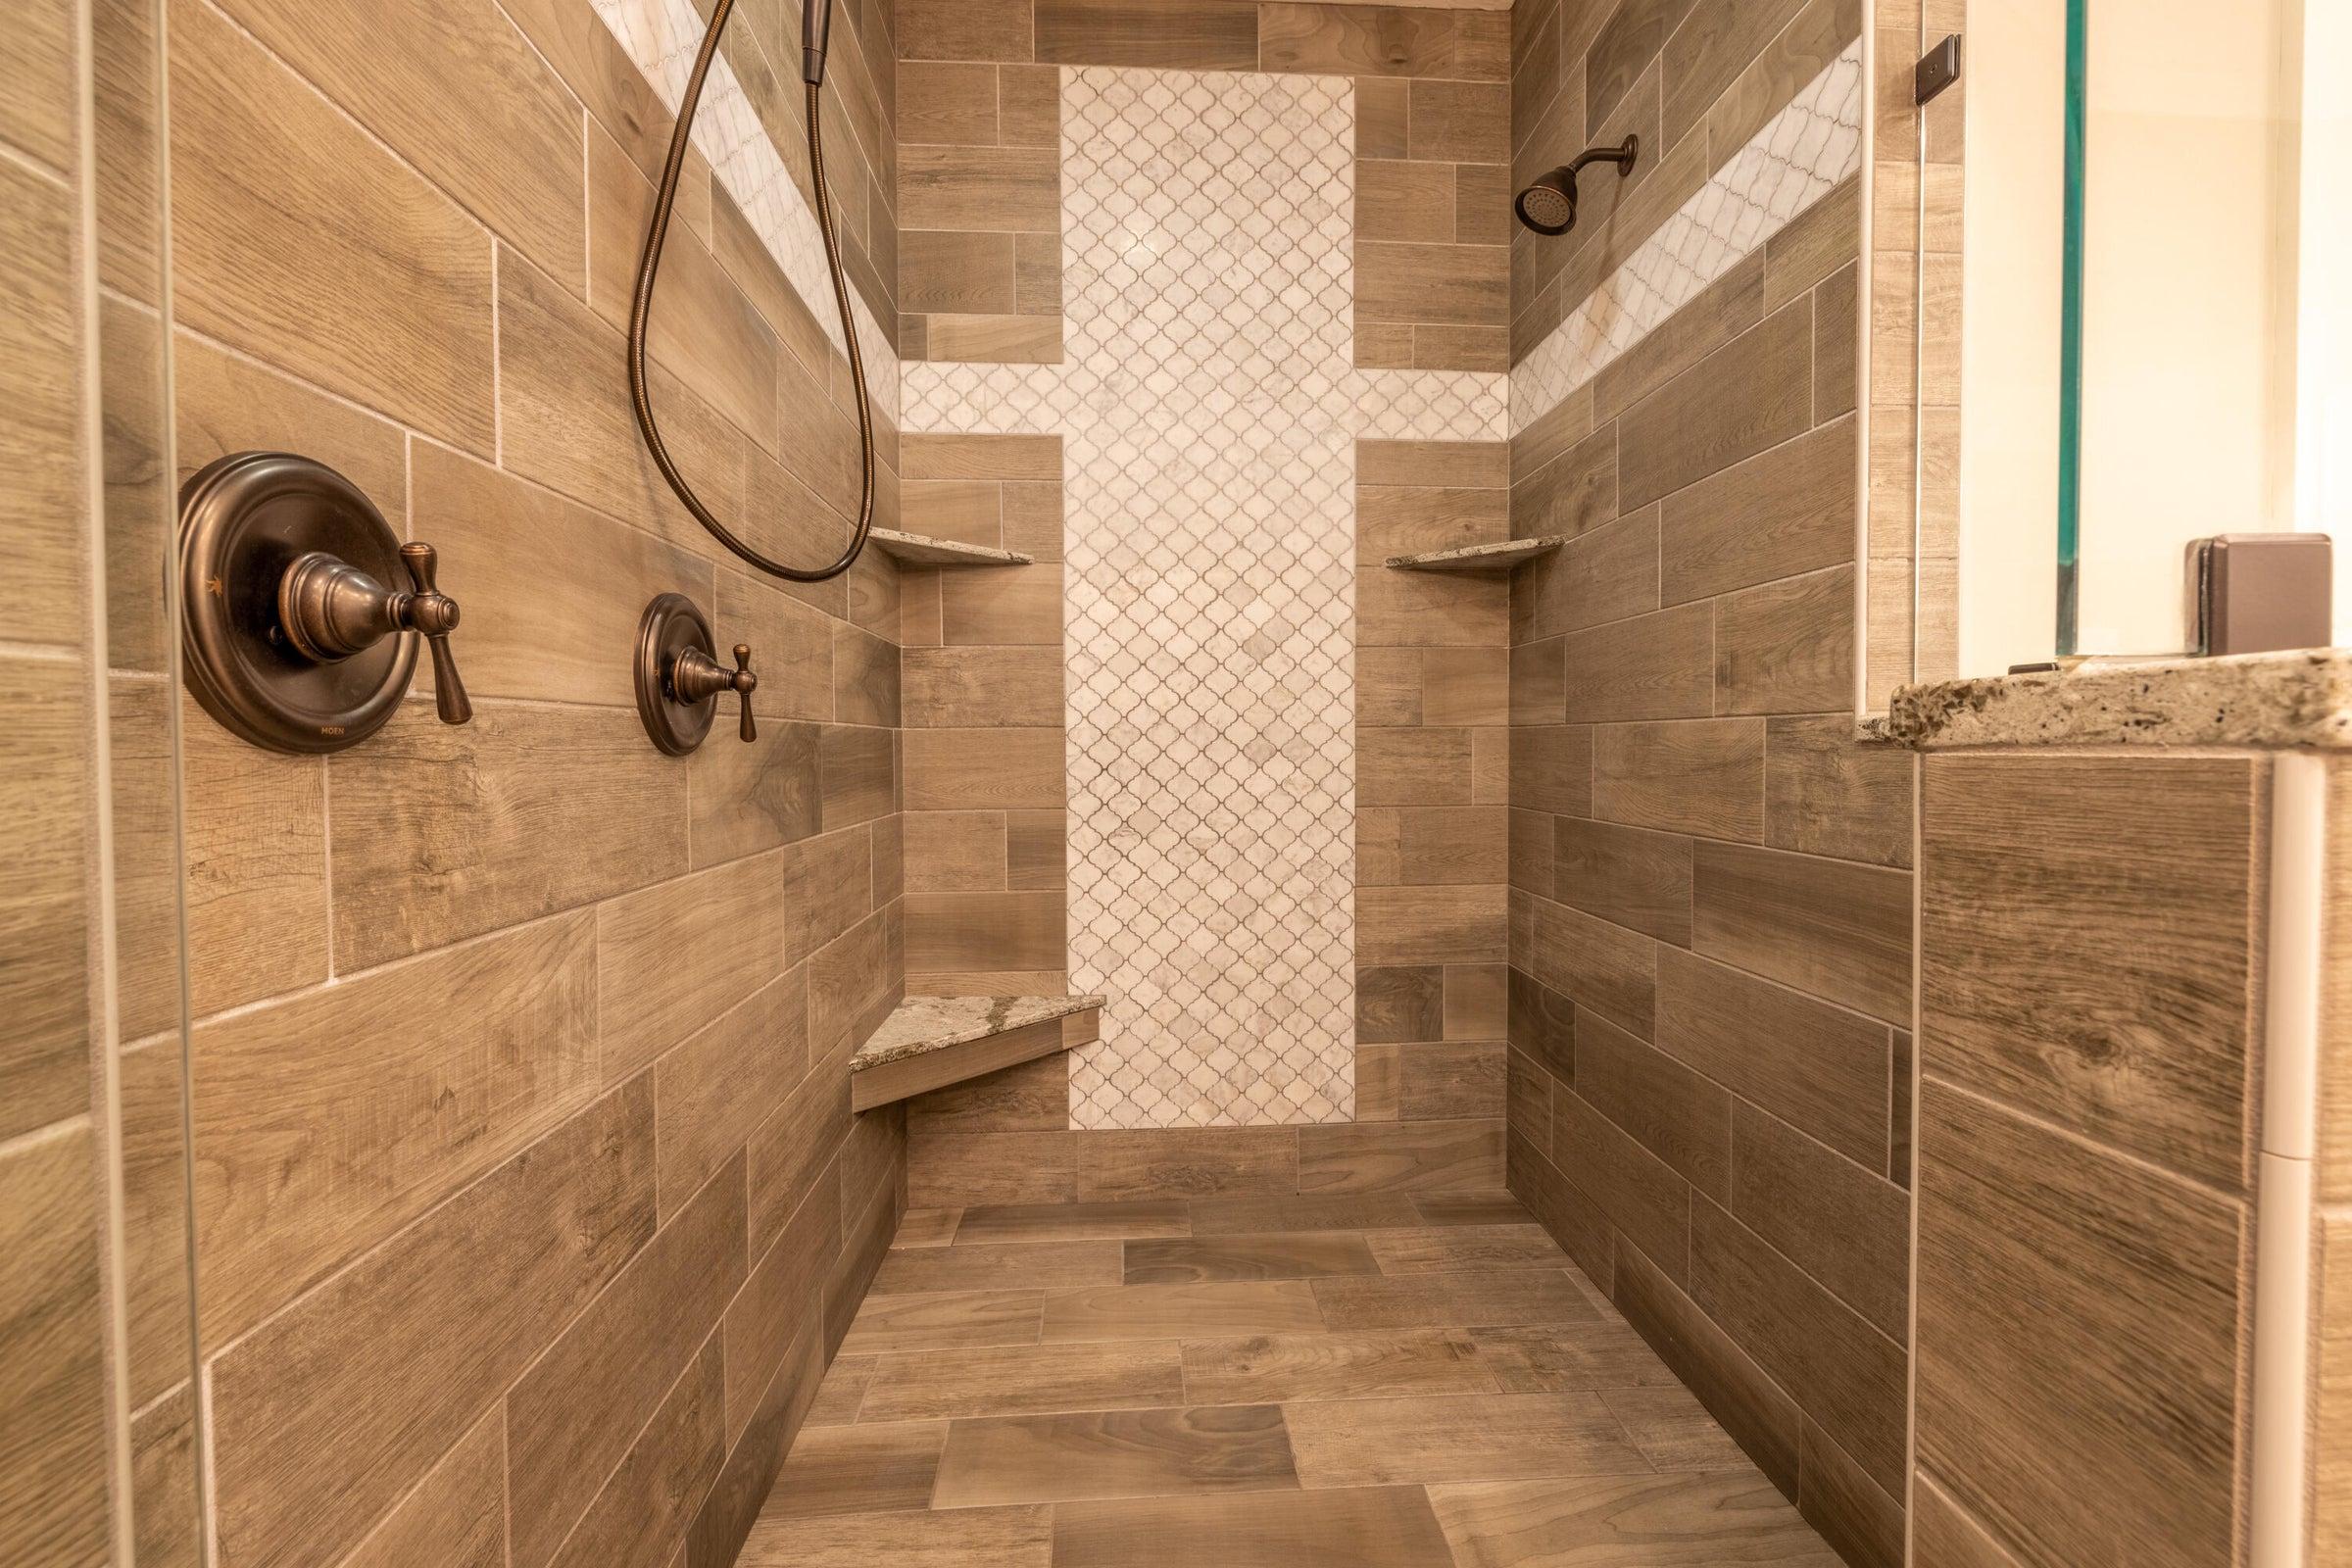 Tile Shower in En-Suite